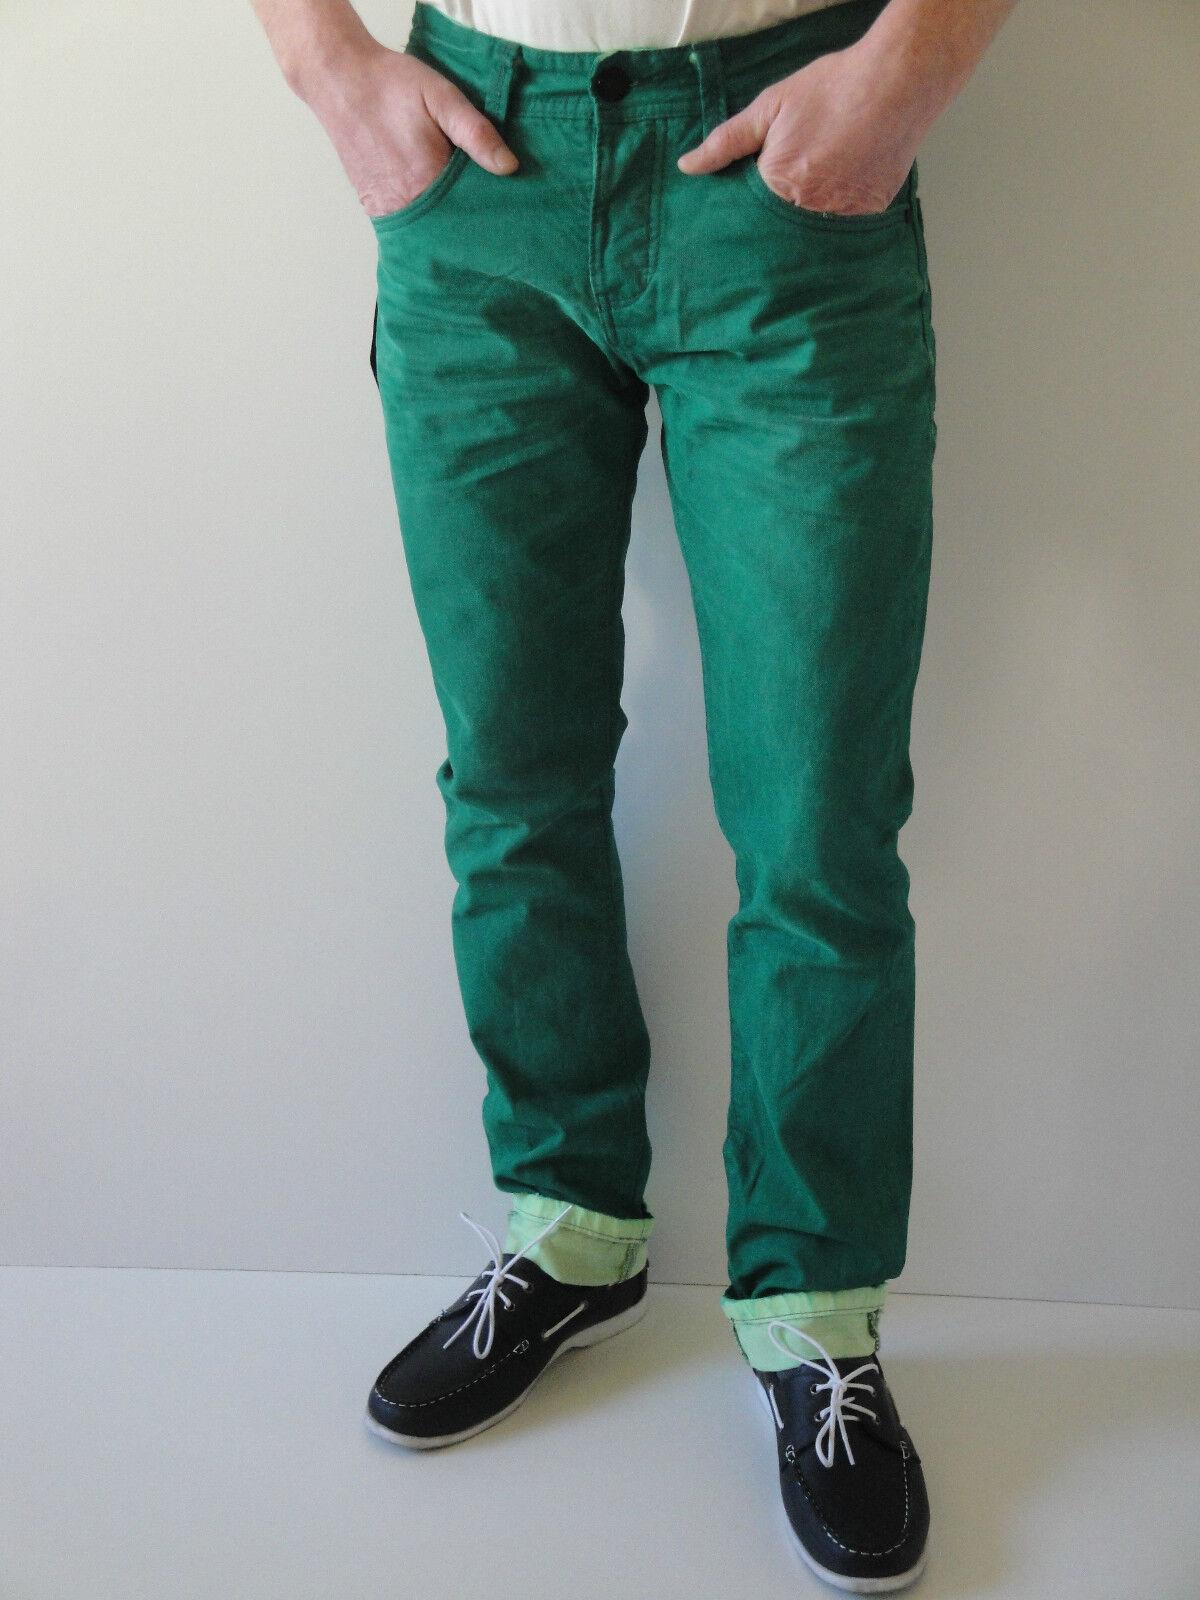 OGE One Green Elephant Columbus Jeans, green, W30,31,32,34,36 L32 L34